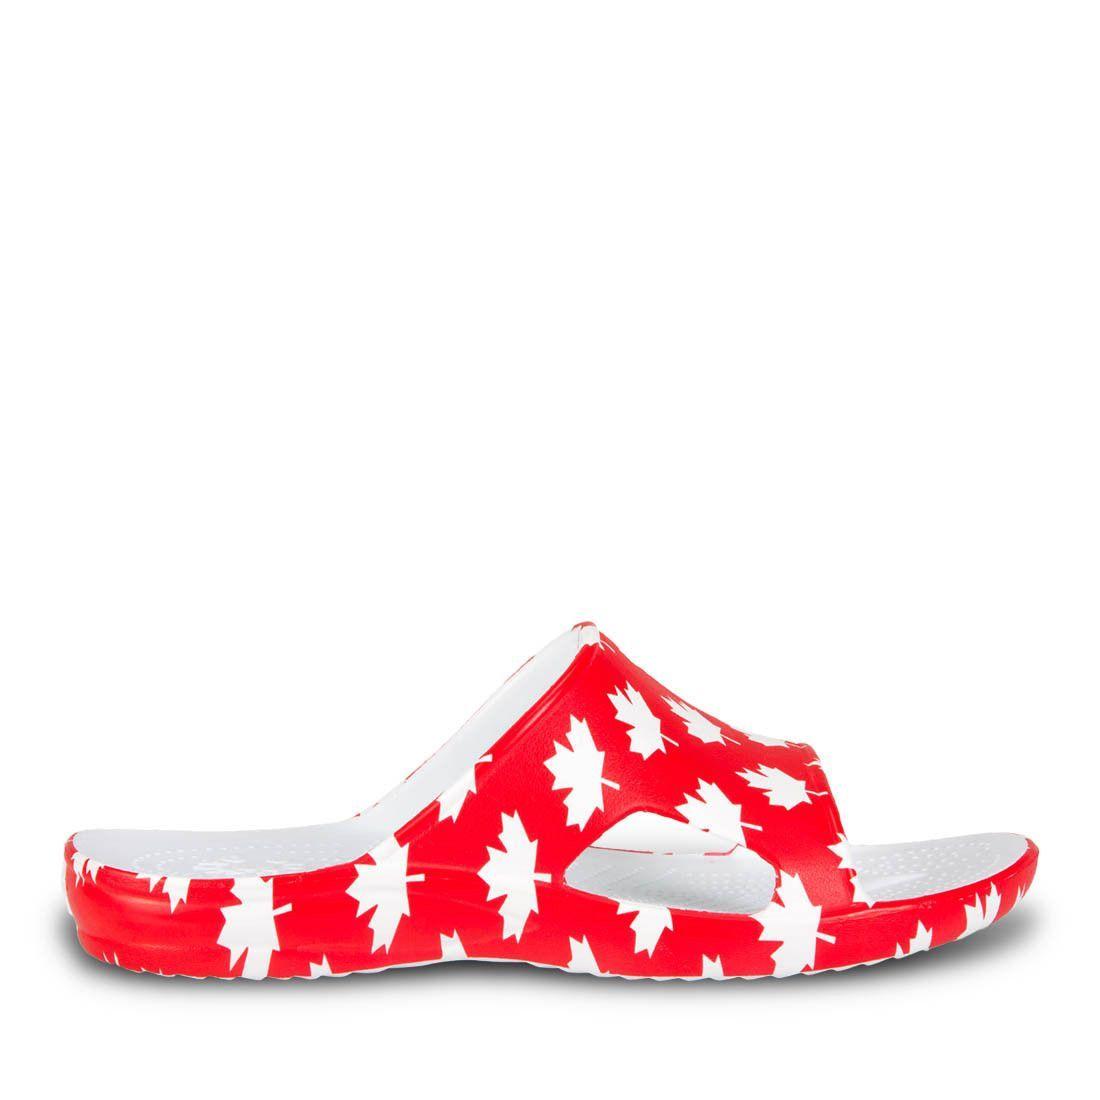 Men's Slides - Canada (Red/White)